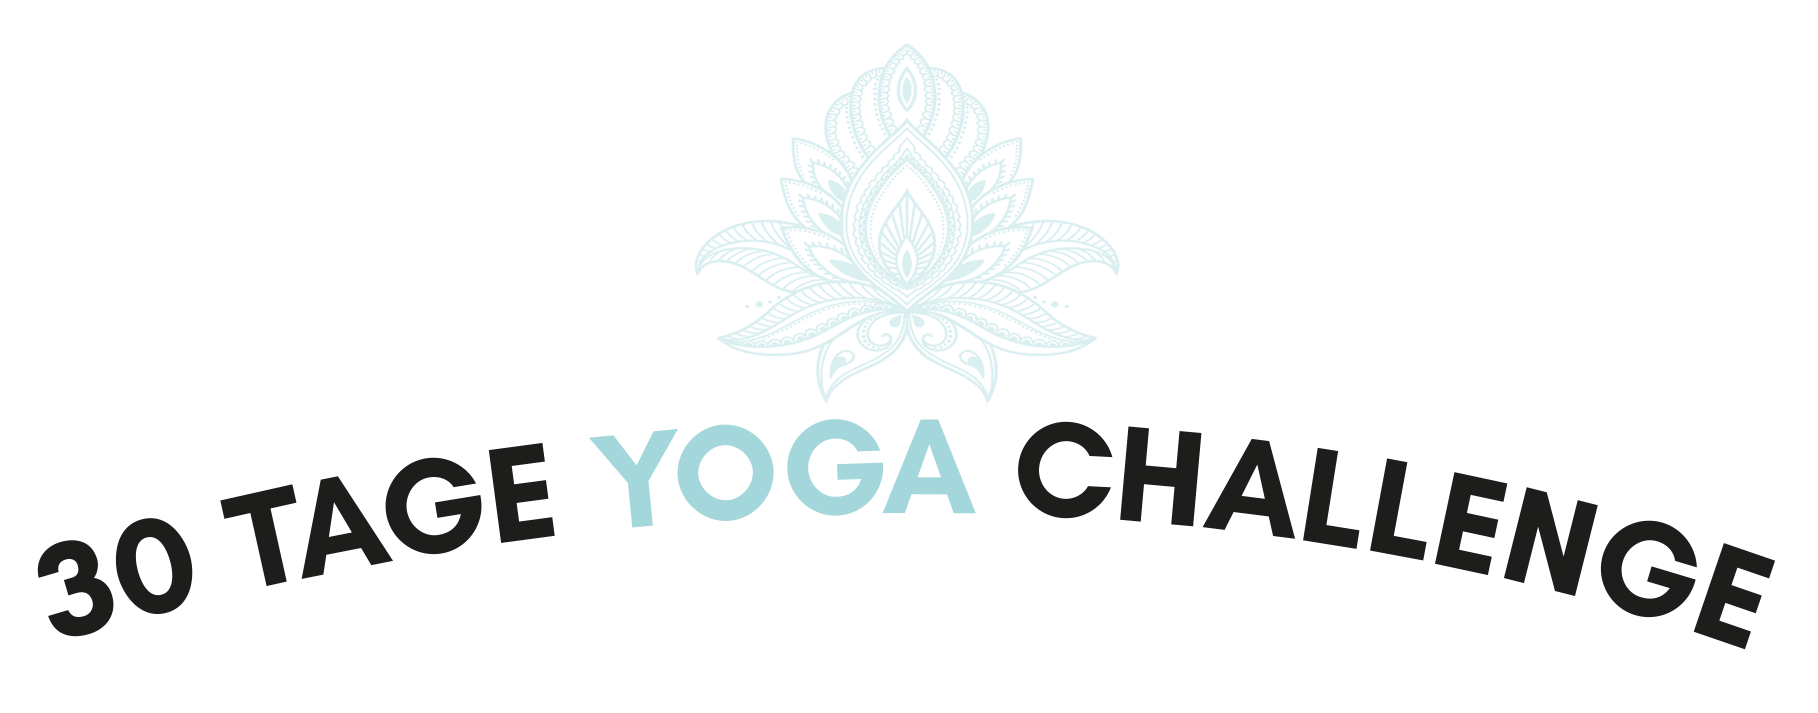 30-tage-yoga-lotus